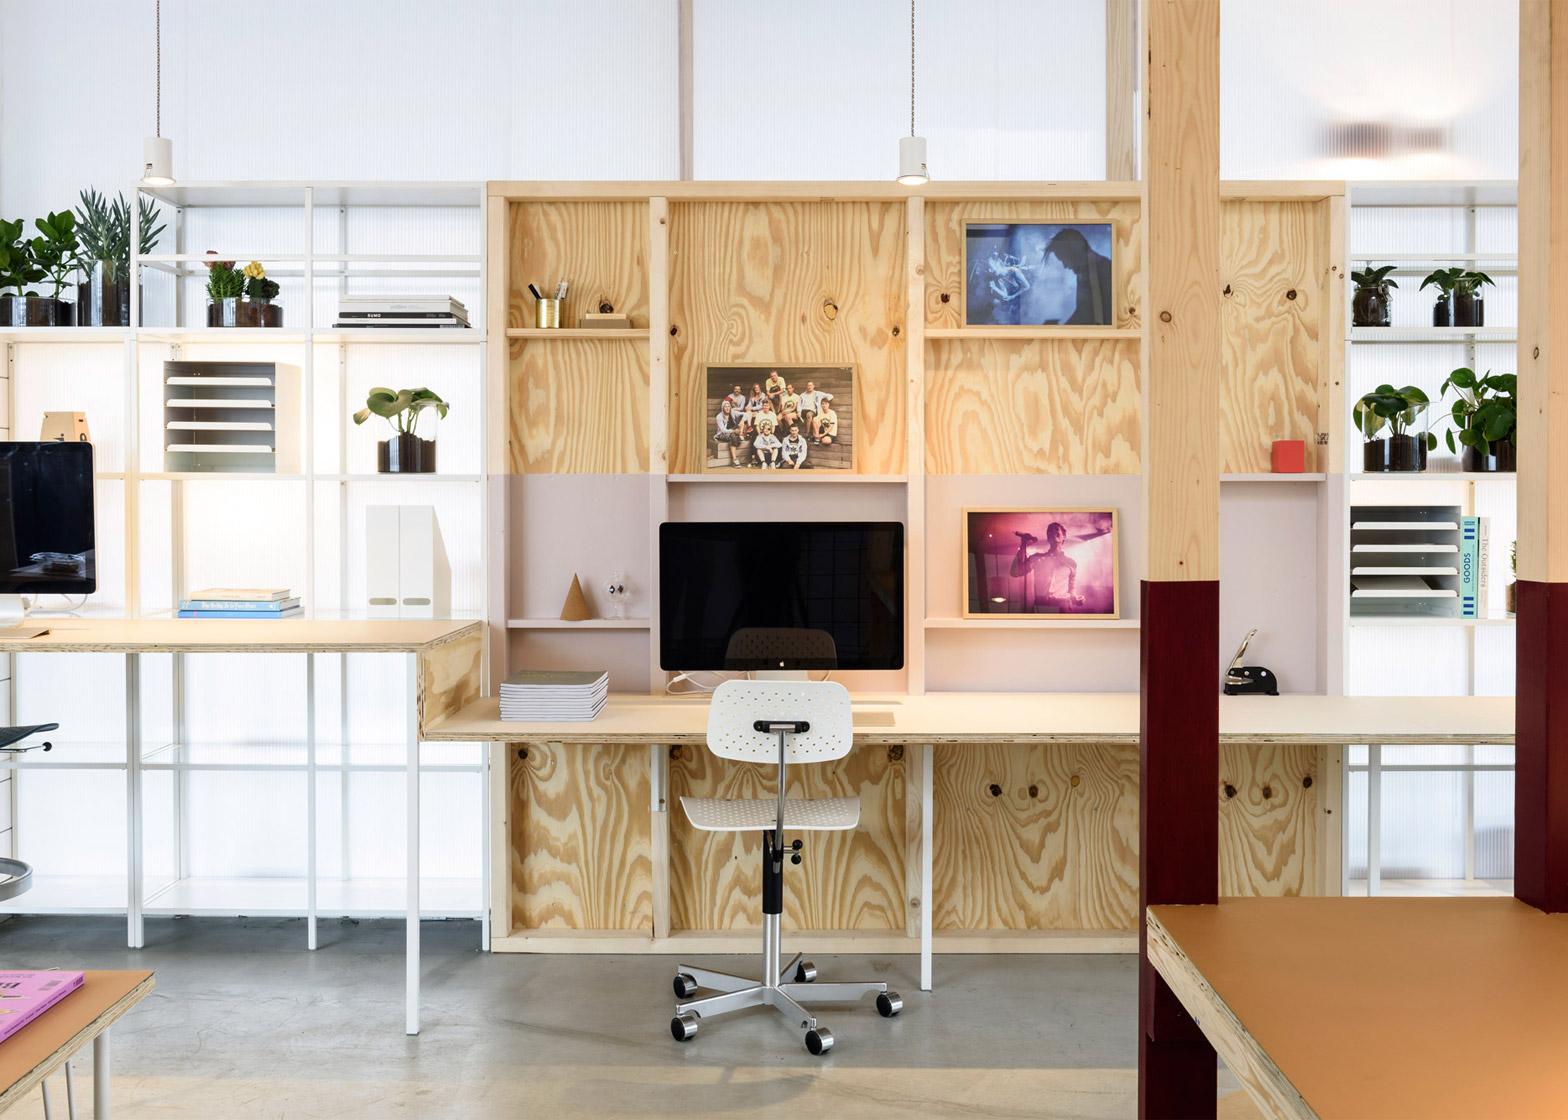 Ikea-Space-10-Innovation-Lab_Alastair-Philip-Wiper_dezeen_1568_11